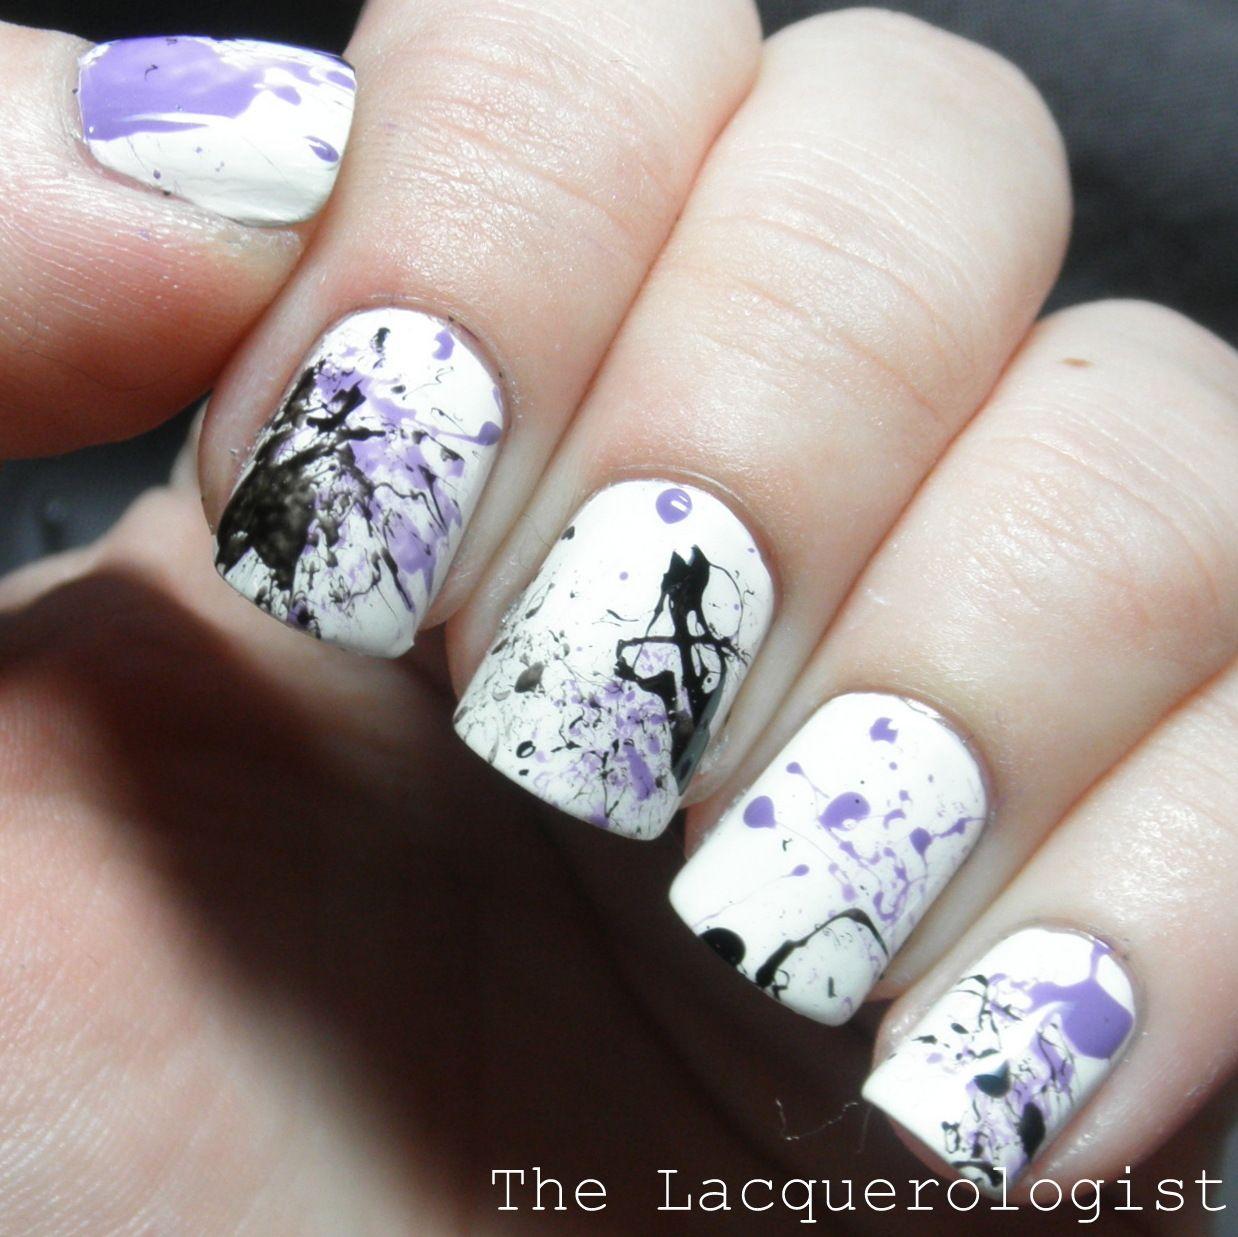 The Lacquerologist: Purple & Black Splatter Nail Art!